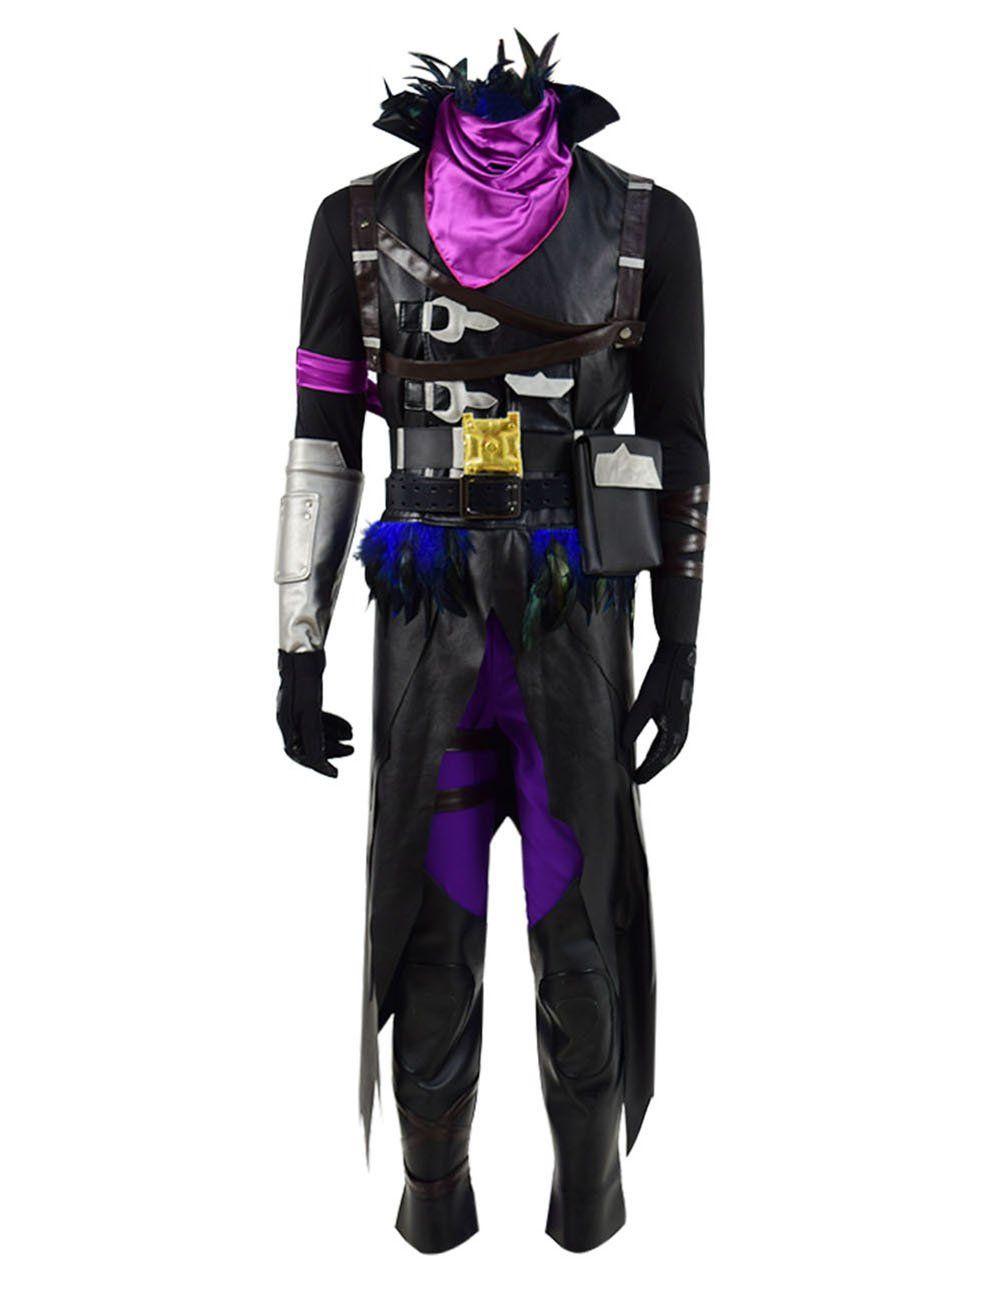 Fortnite Cosplay Costumes Halloween Ideas For Women Diy